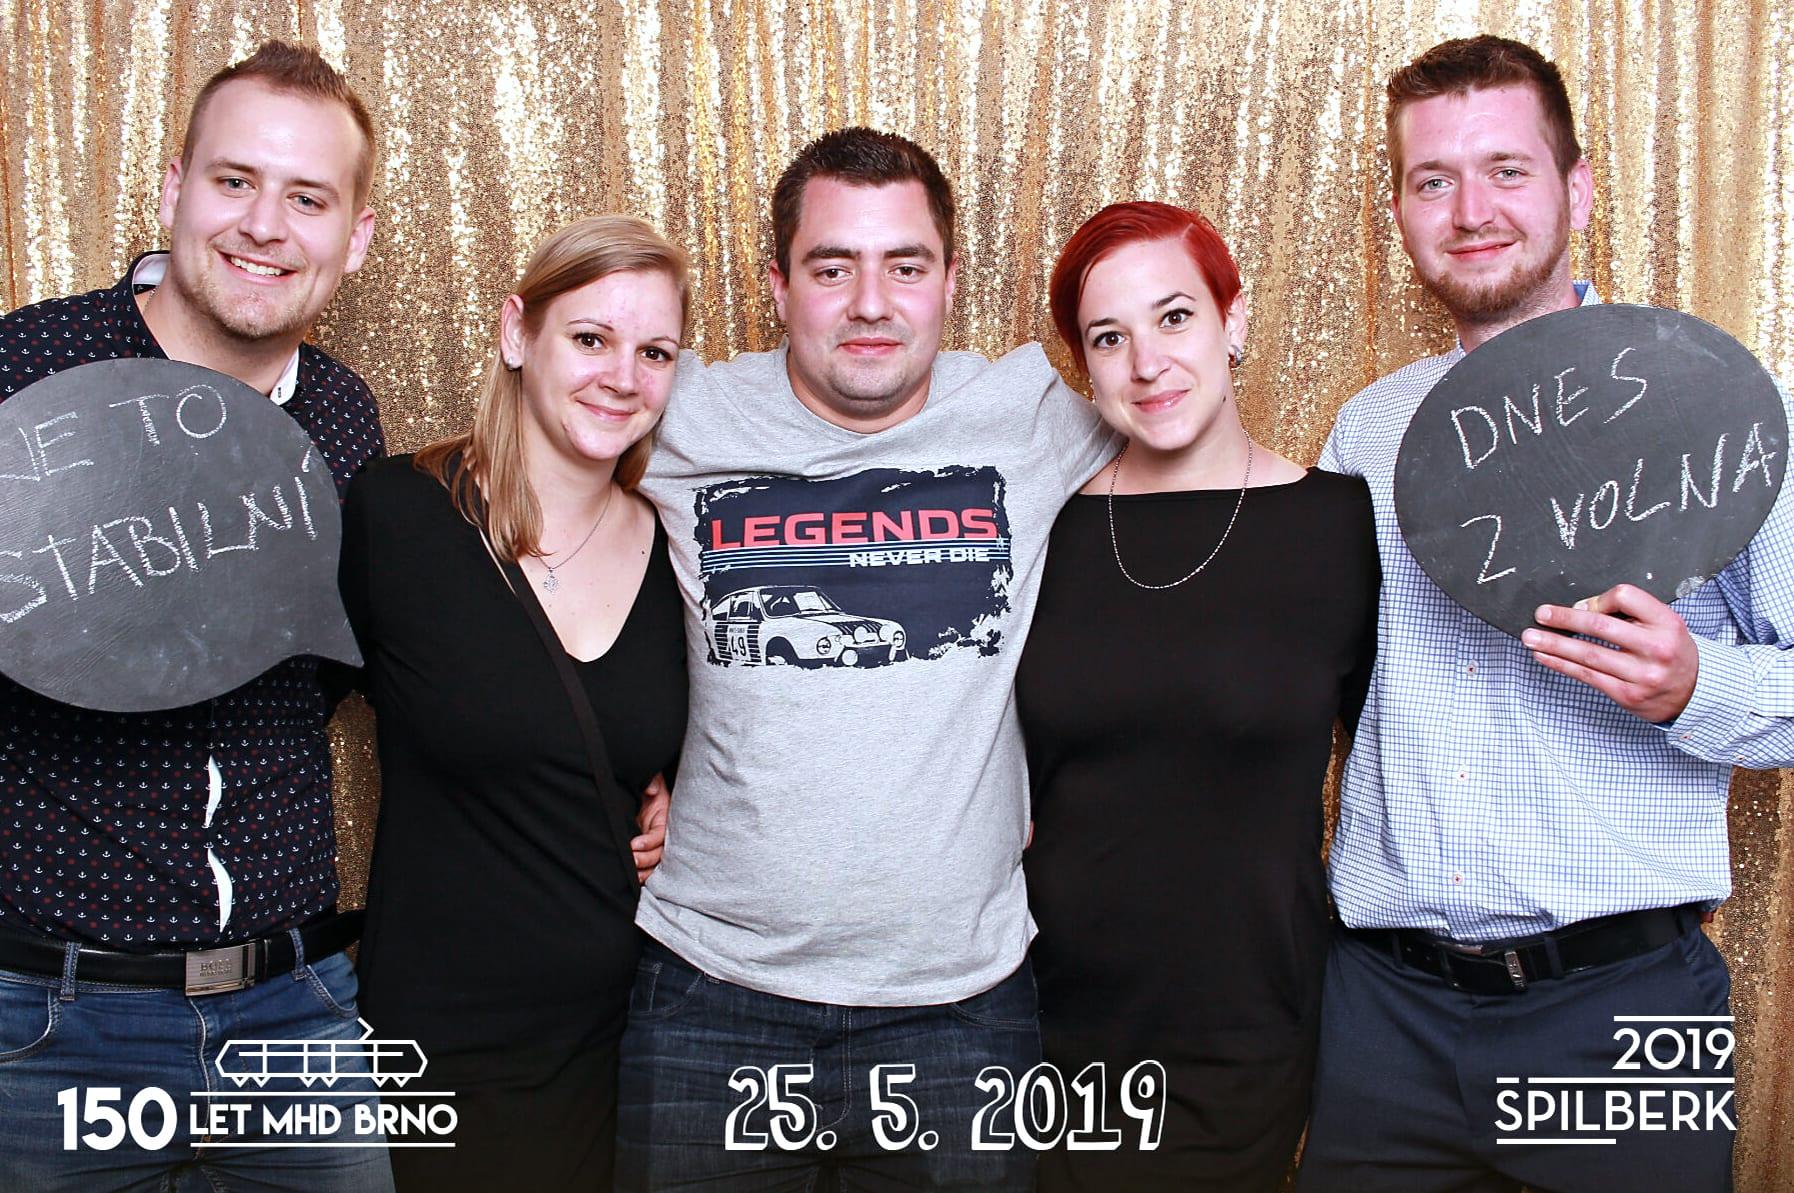 fotokoutek-mhd-brno-25-5-2019-609962